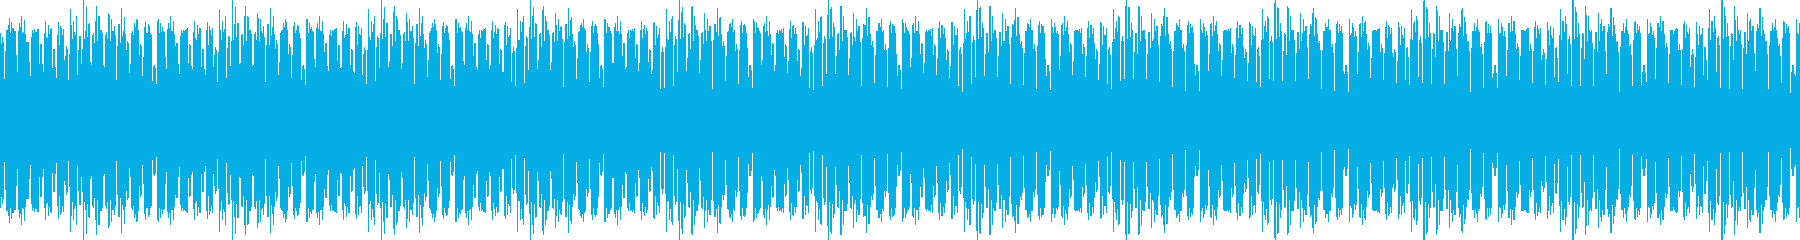 AMGアナログFX 45の再生済みの波形